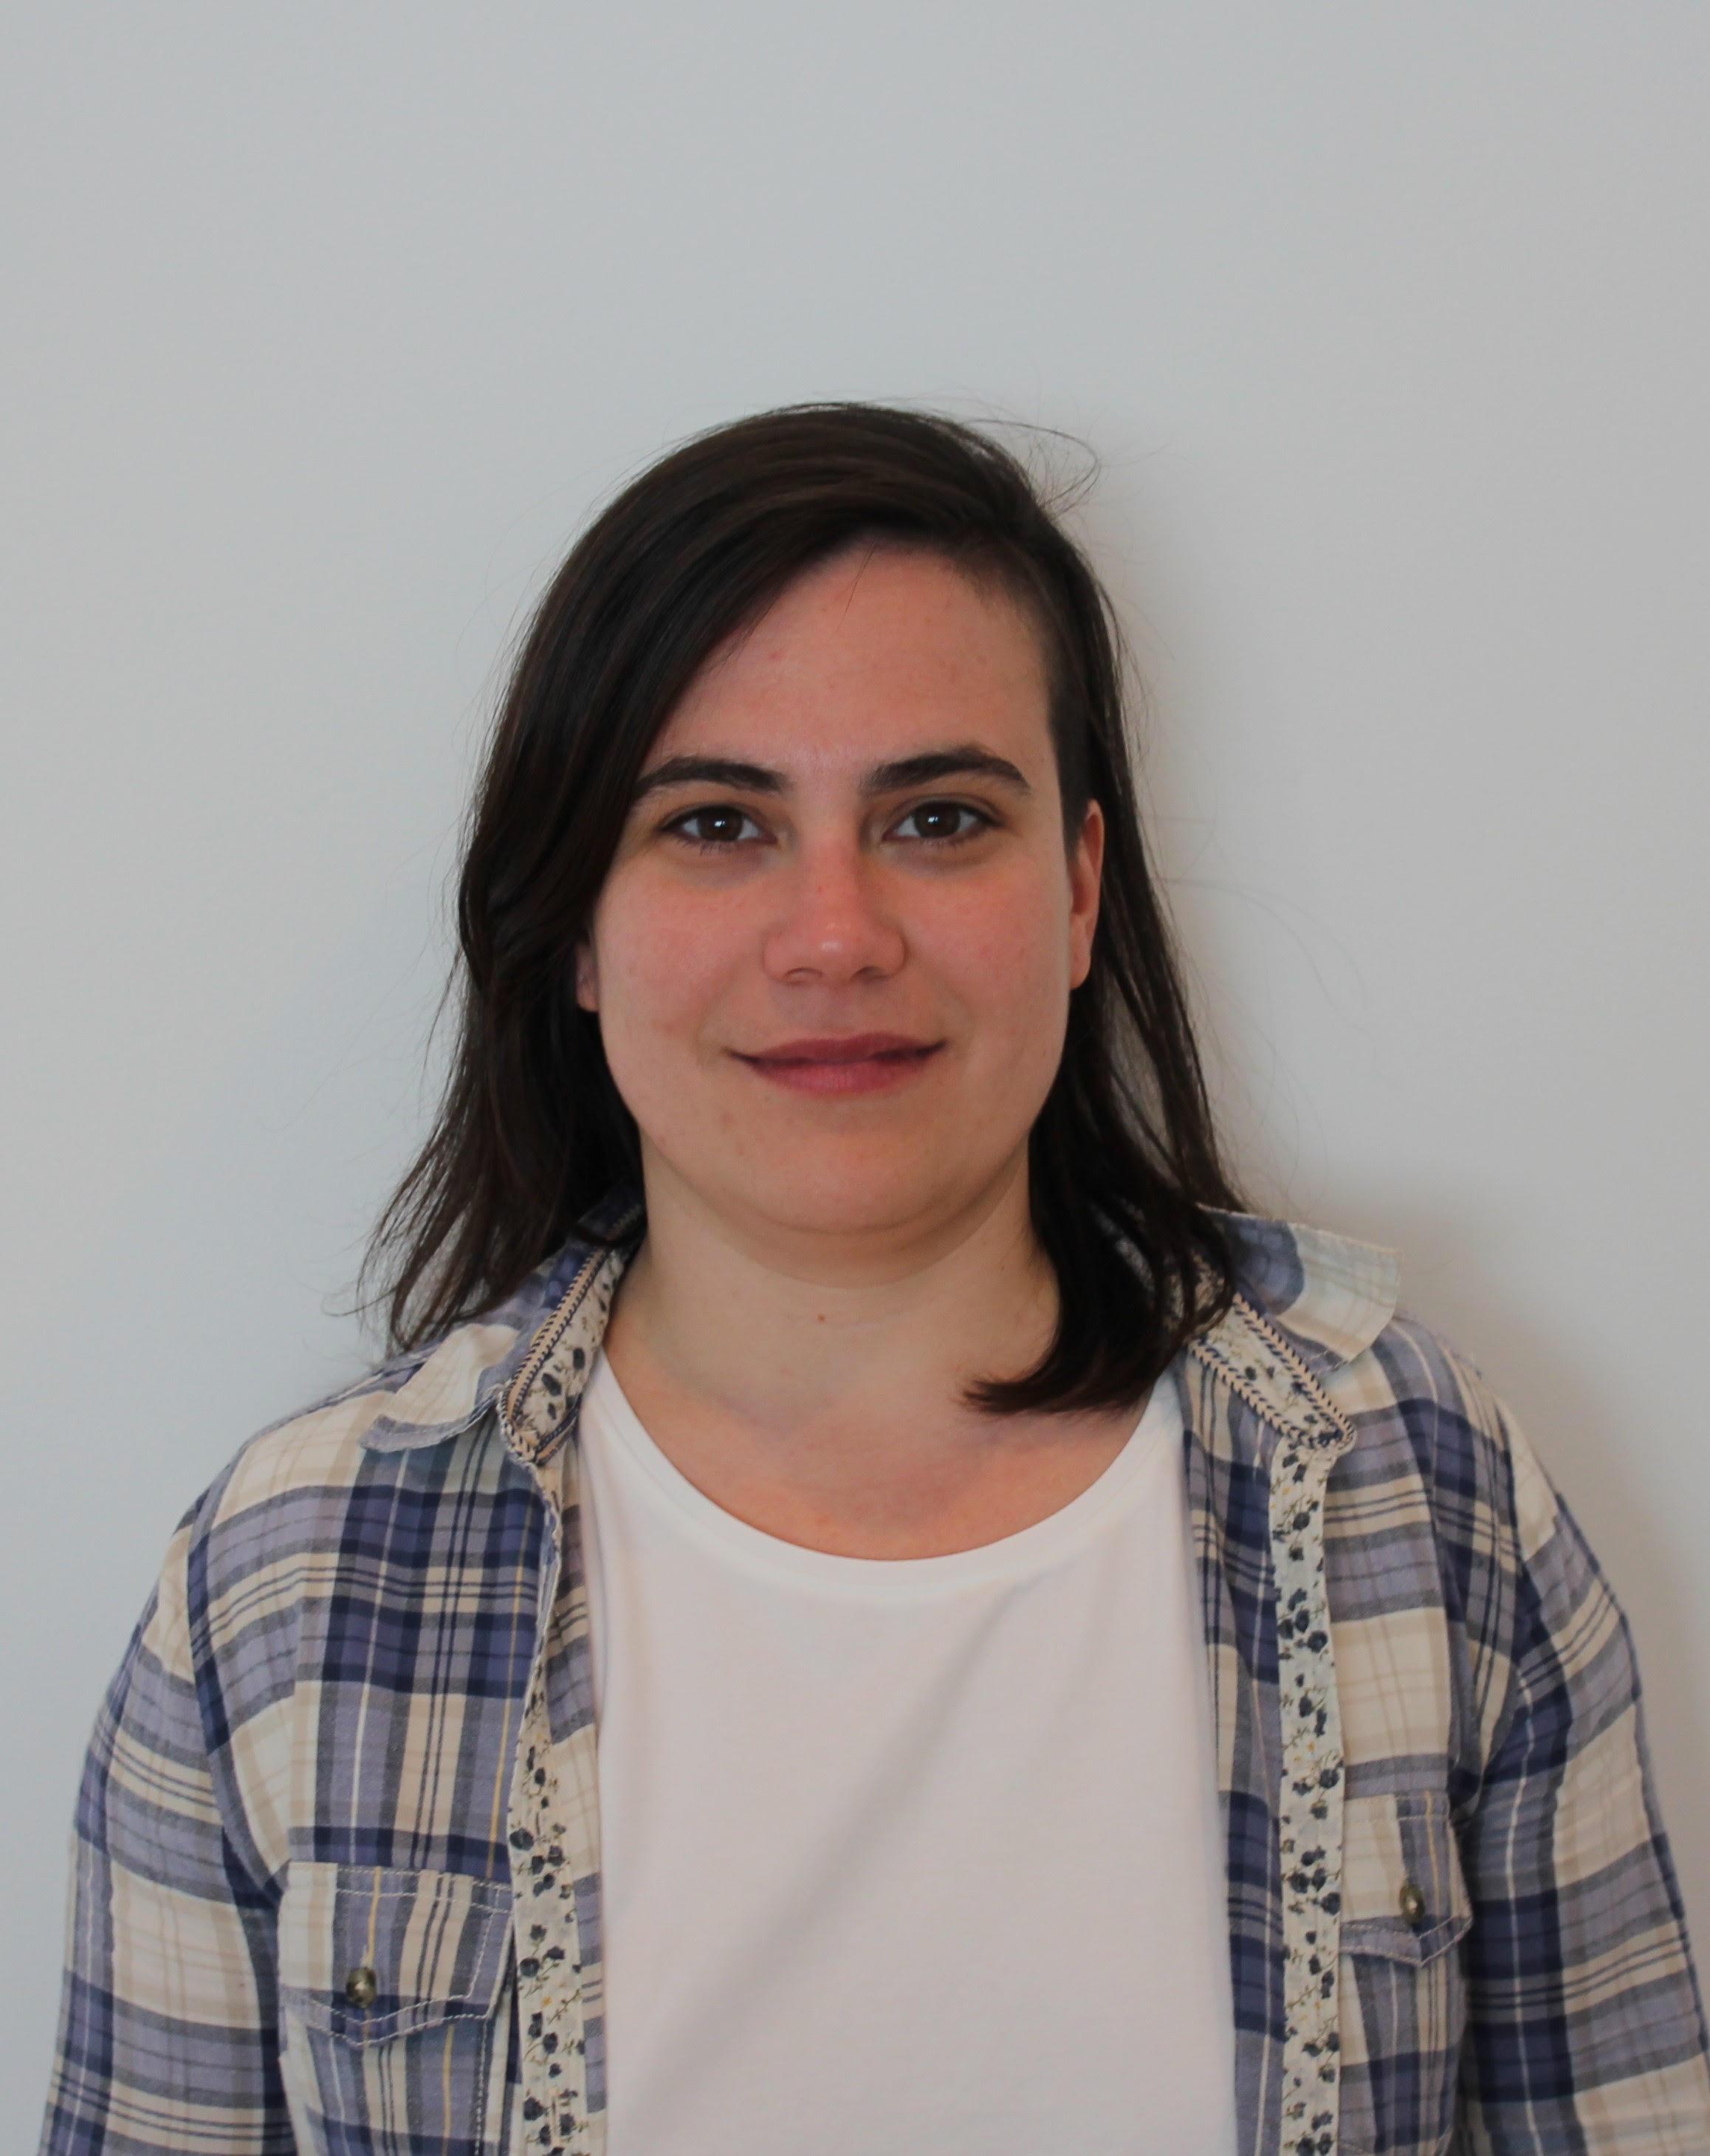 Ana Pérez Rodríguez